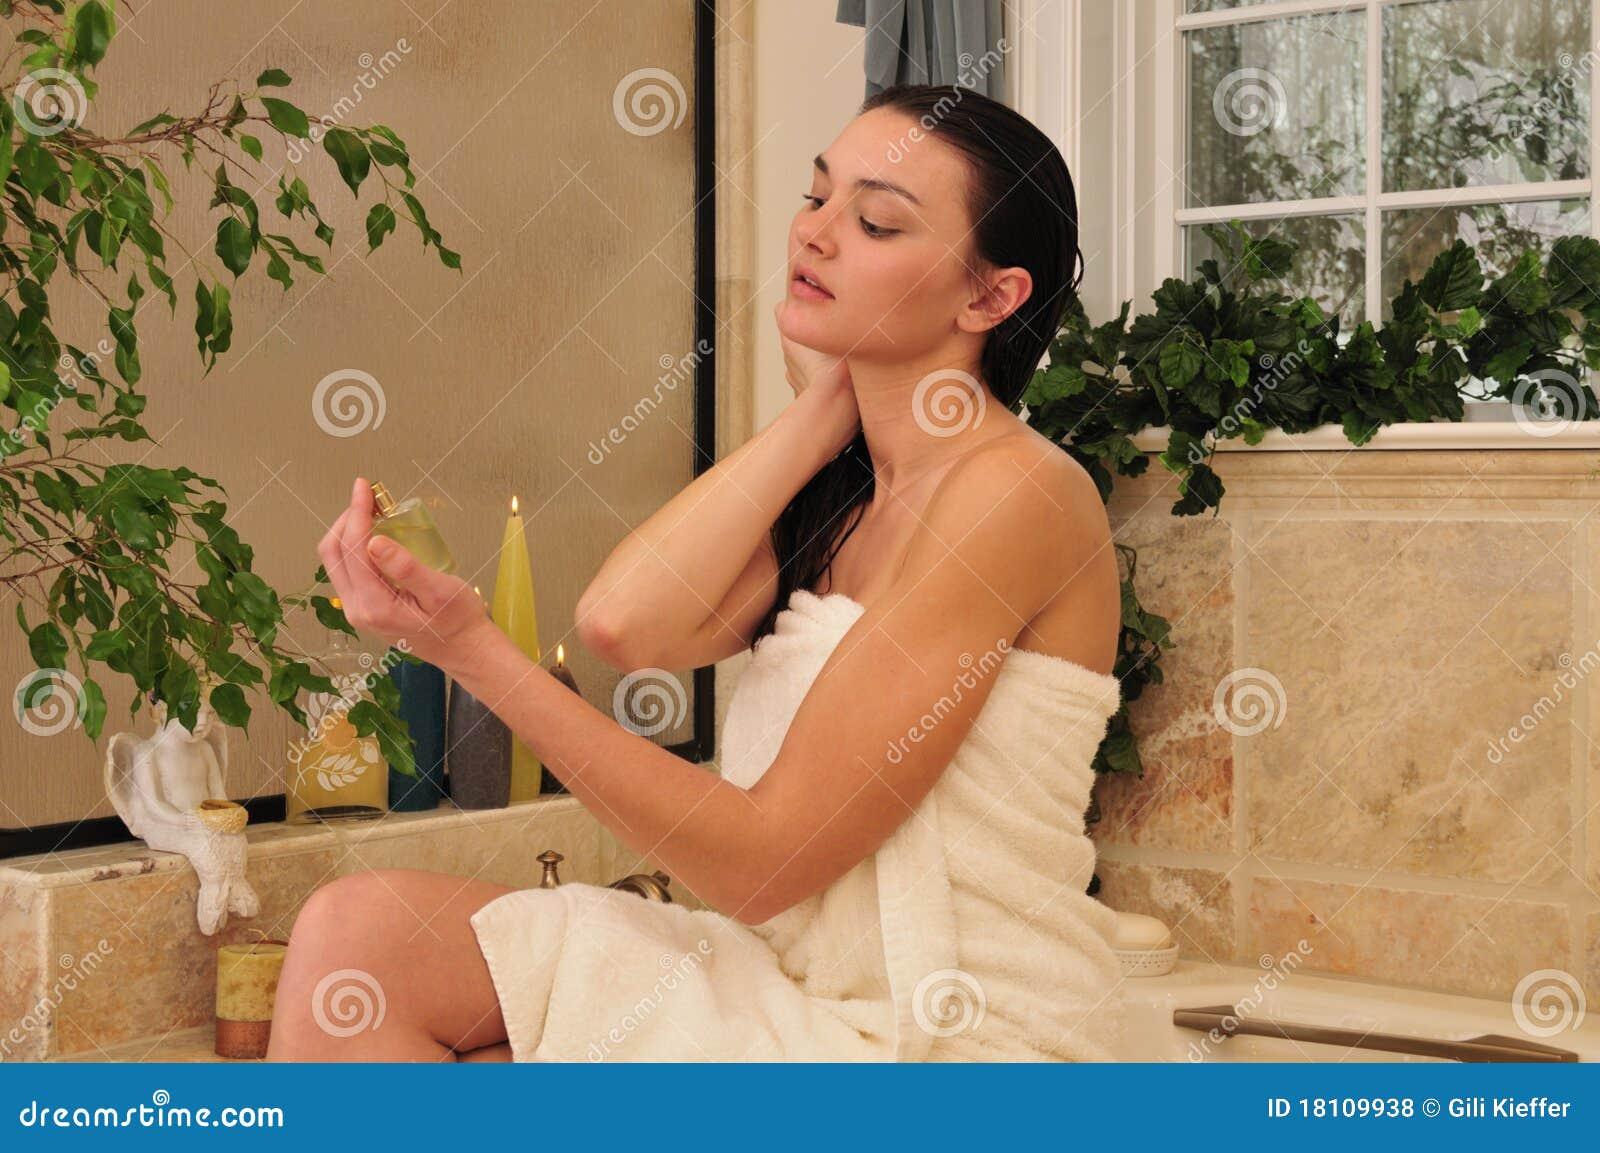 pics of women using the bathroom hopefully this